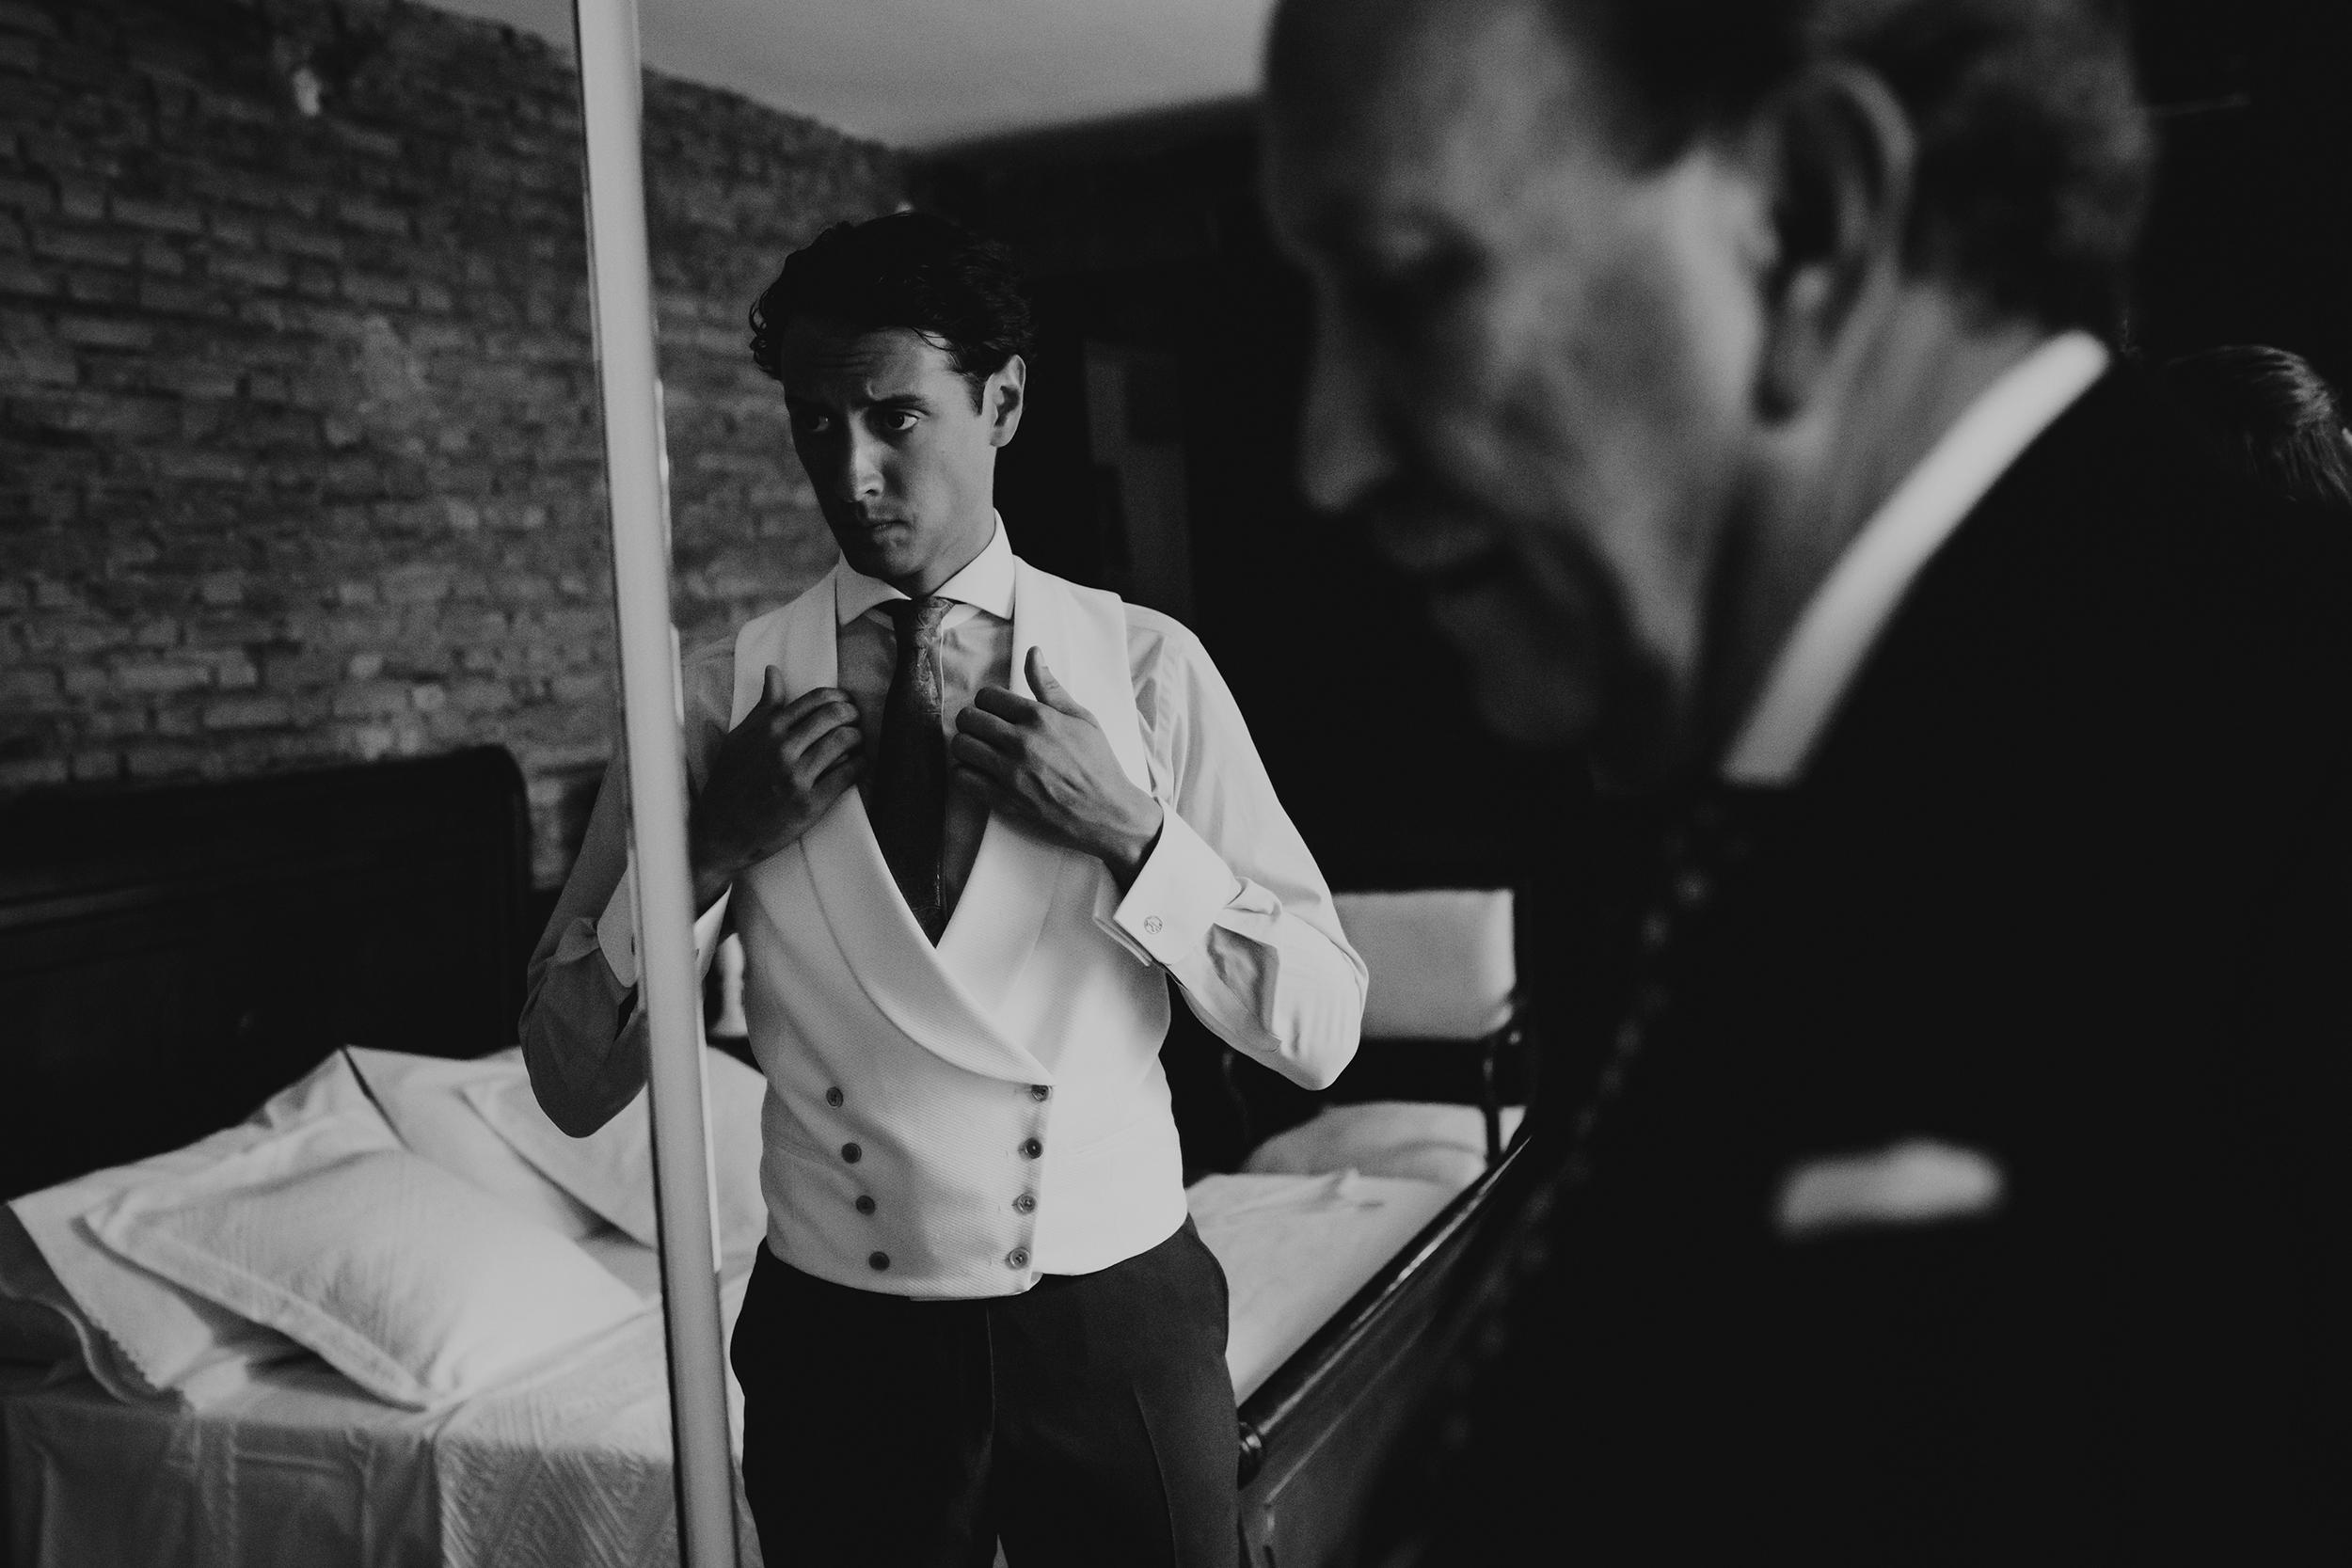 fotografo-bodas-granada-catedral-sagrario-jose-reyes_011.jpg